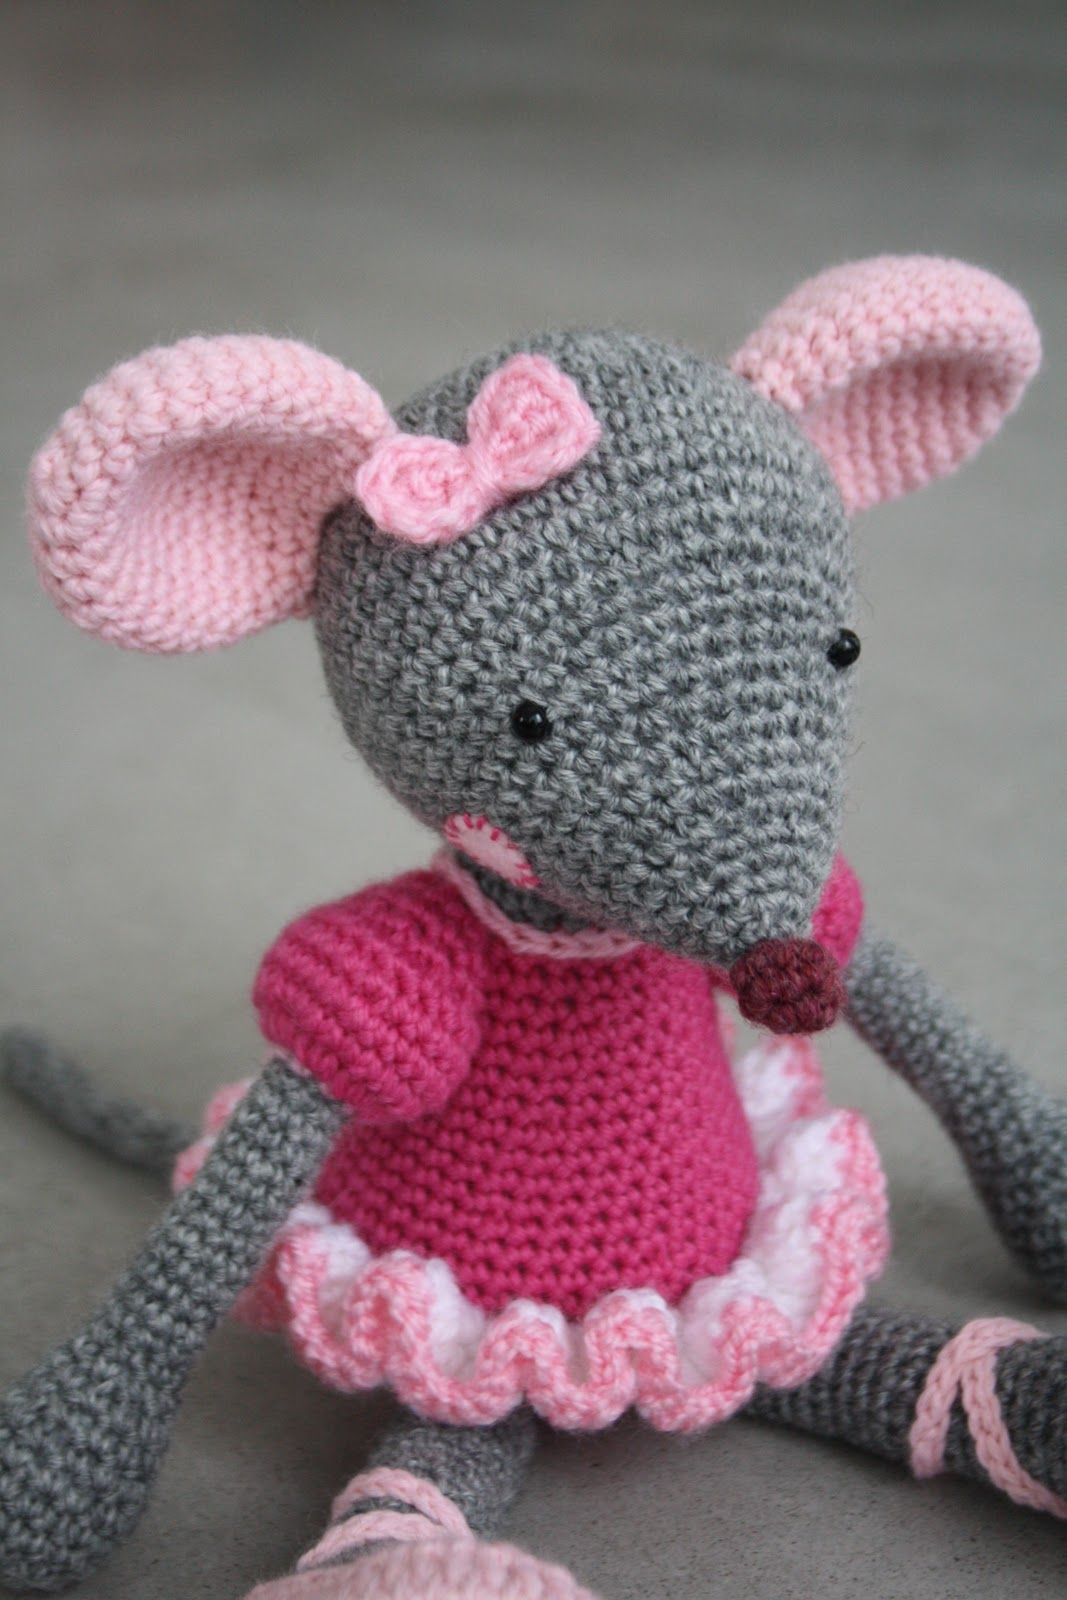 flower Rail - world full of cuteness and amigurumi: Mice   Yarn ...